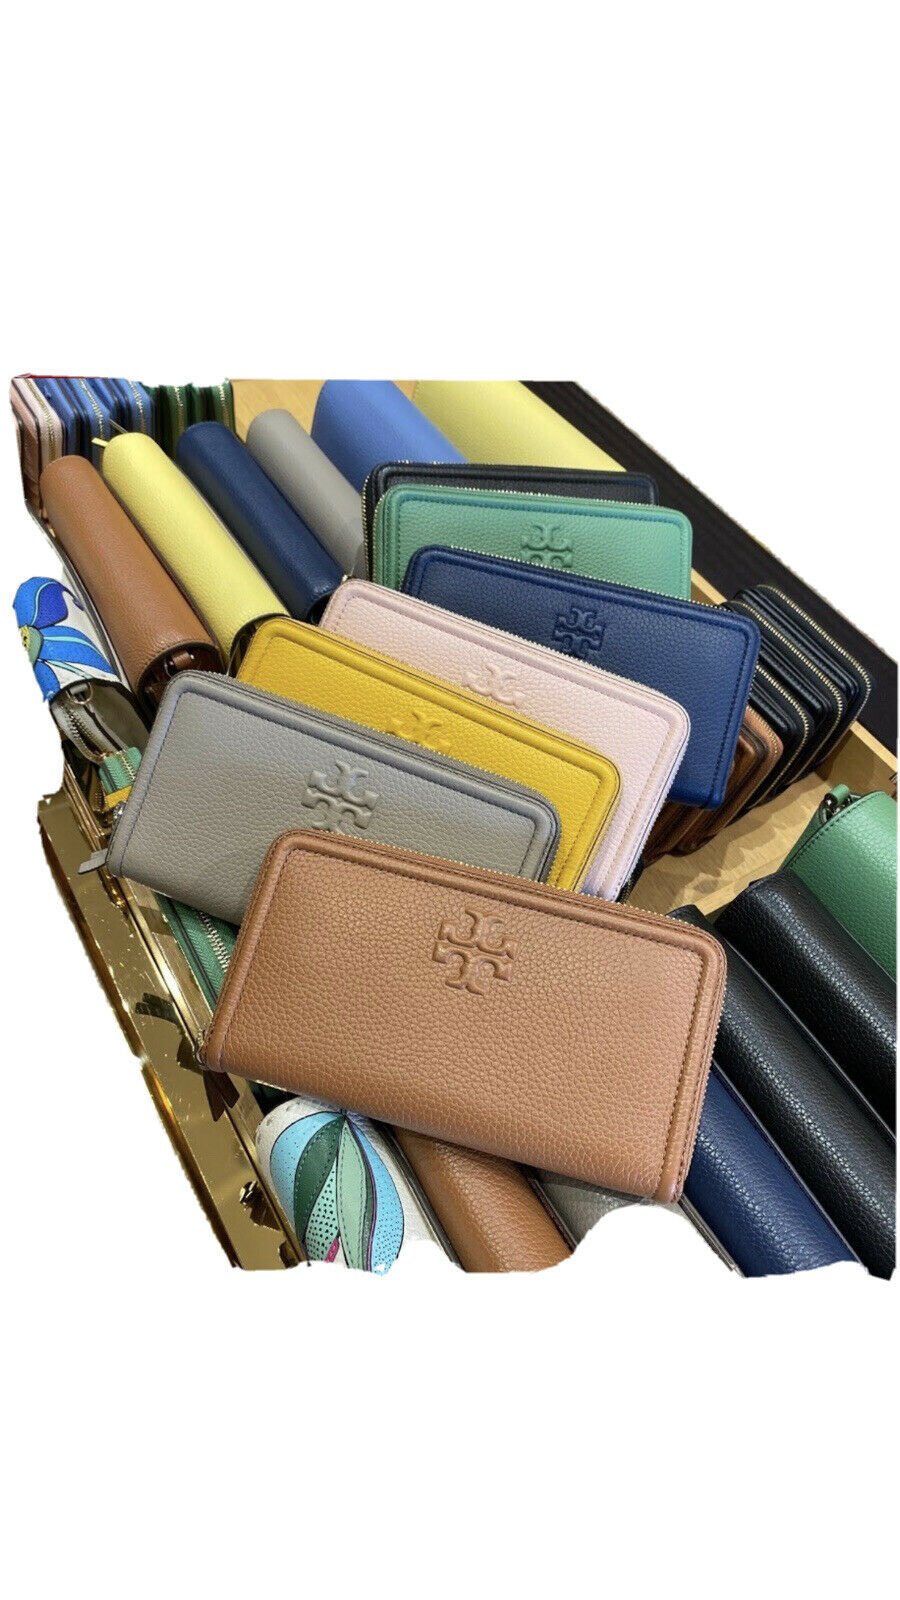 NWT Tory Burch Thea Classic Tan Continental Zip Wallet